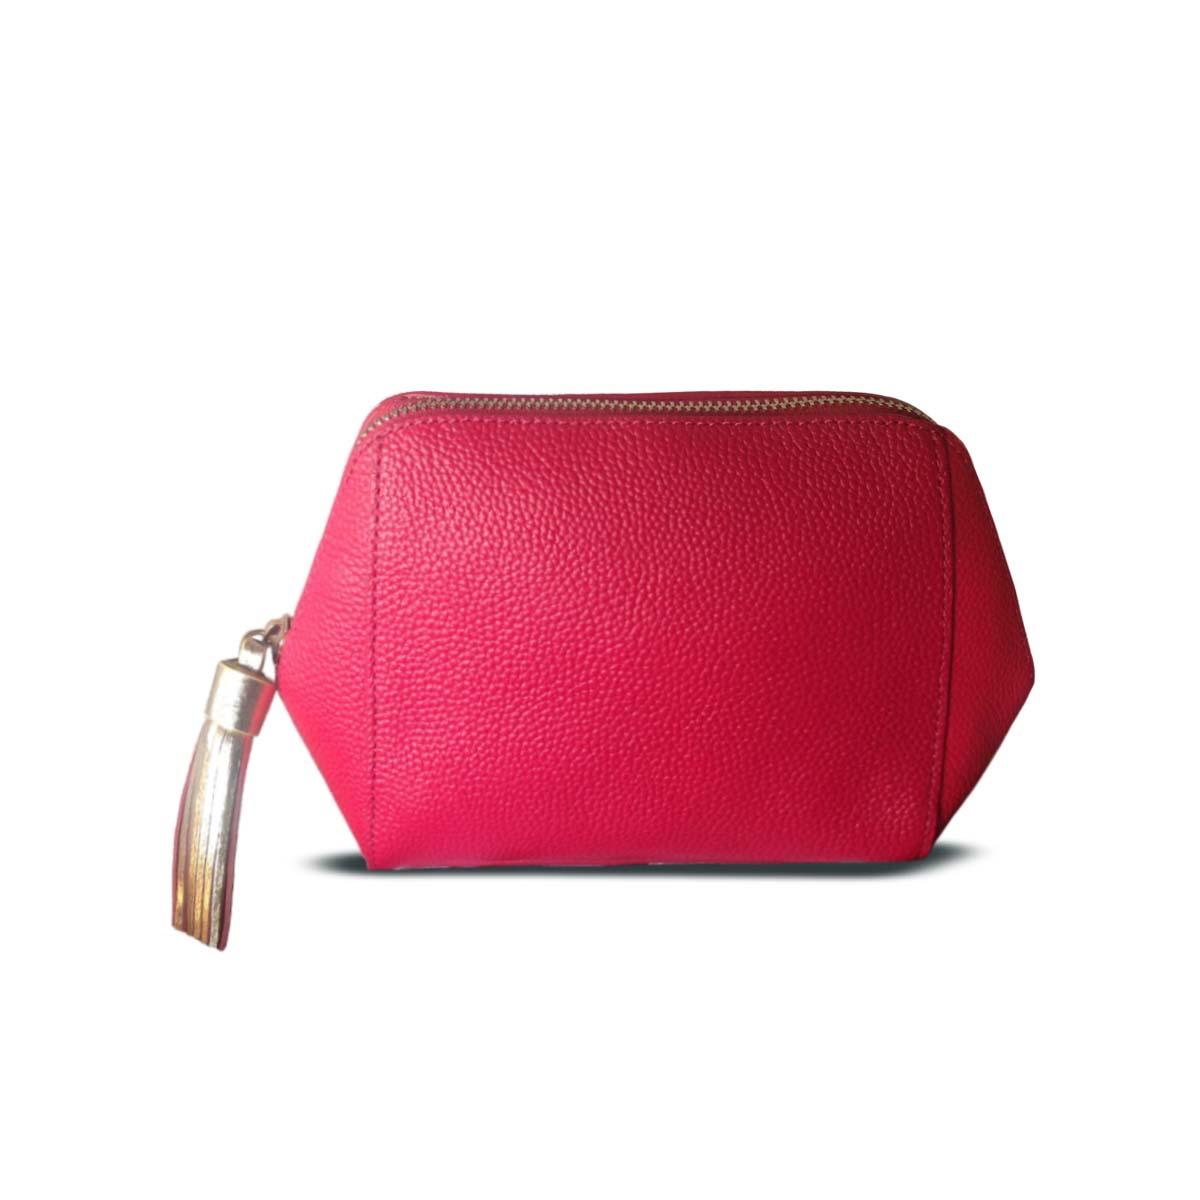 HOBBS Pippa Fuchsia PINK Leather Trapezoid Luxury Cosmetic Bag ... 104501c79cb1c